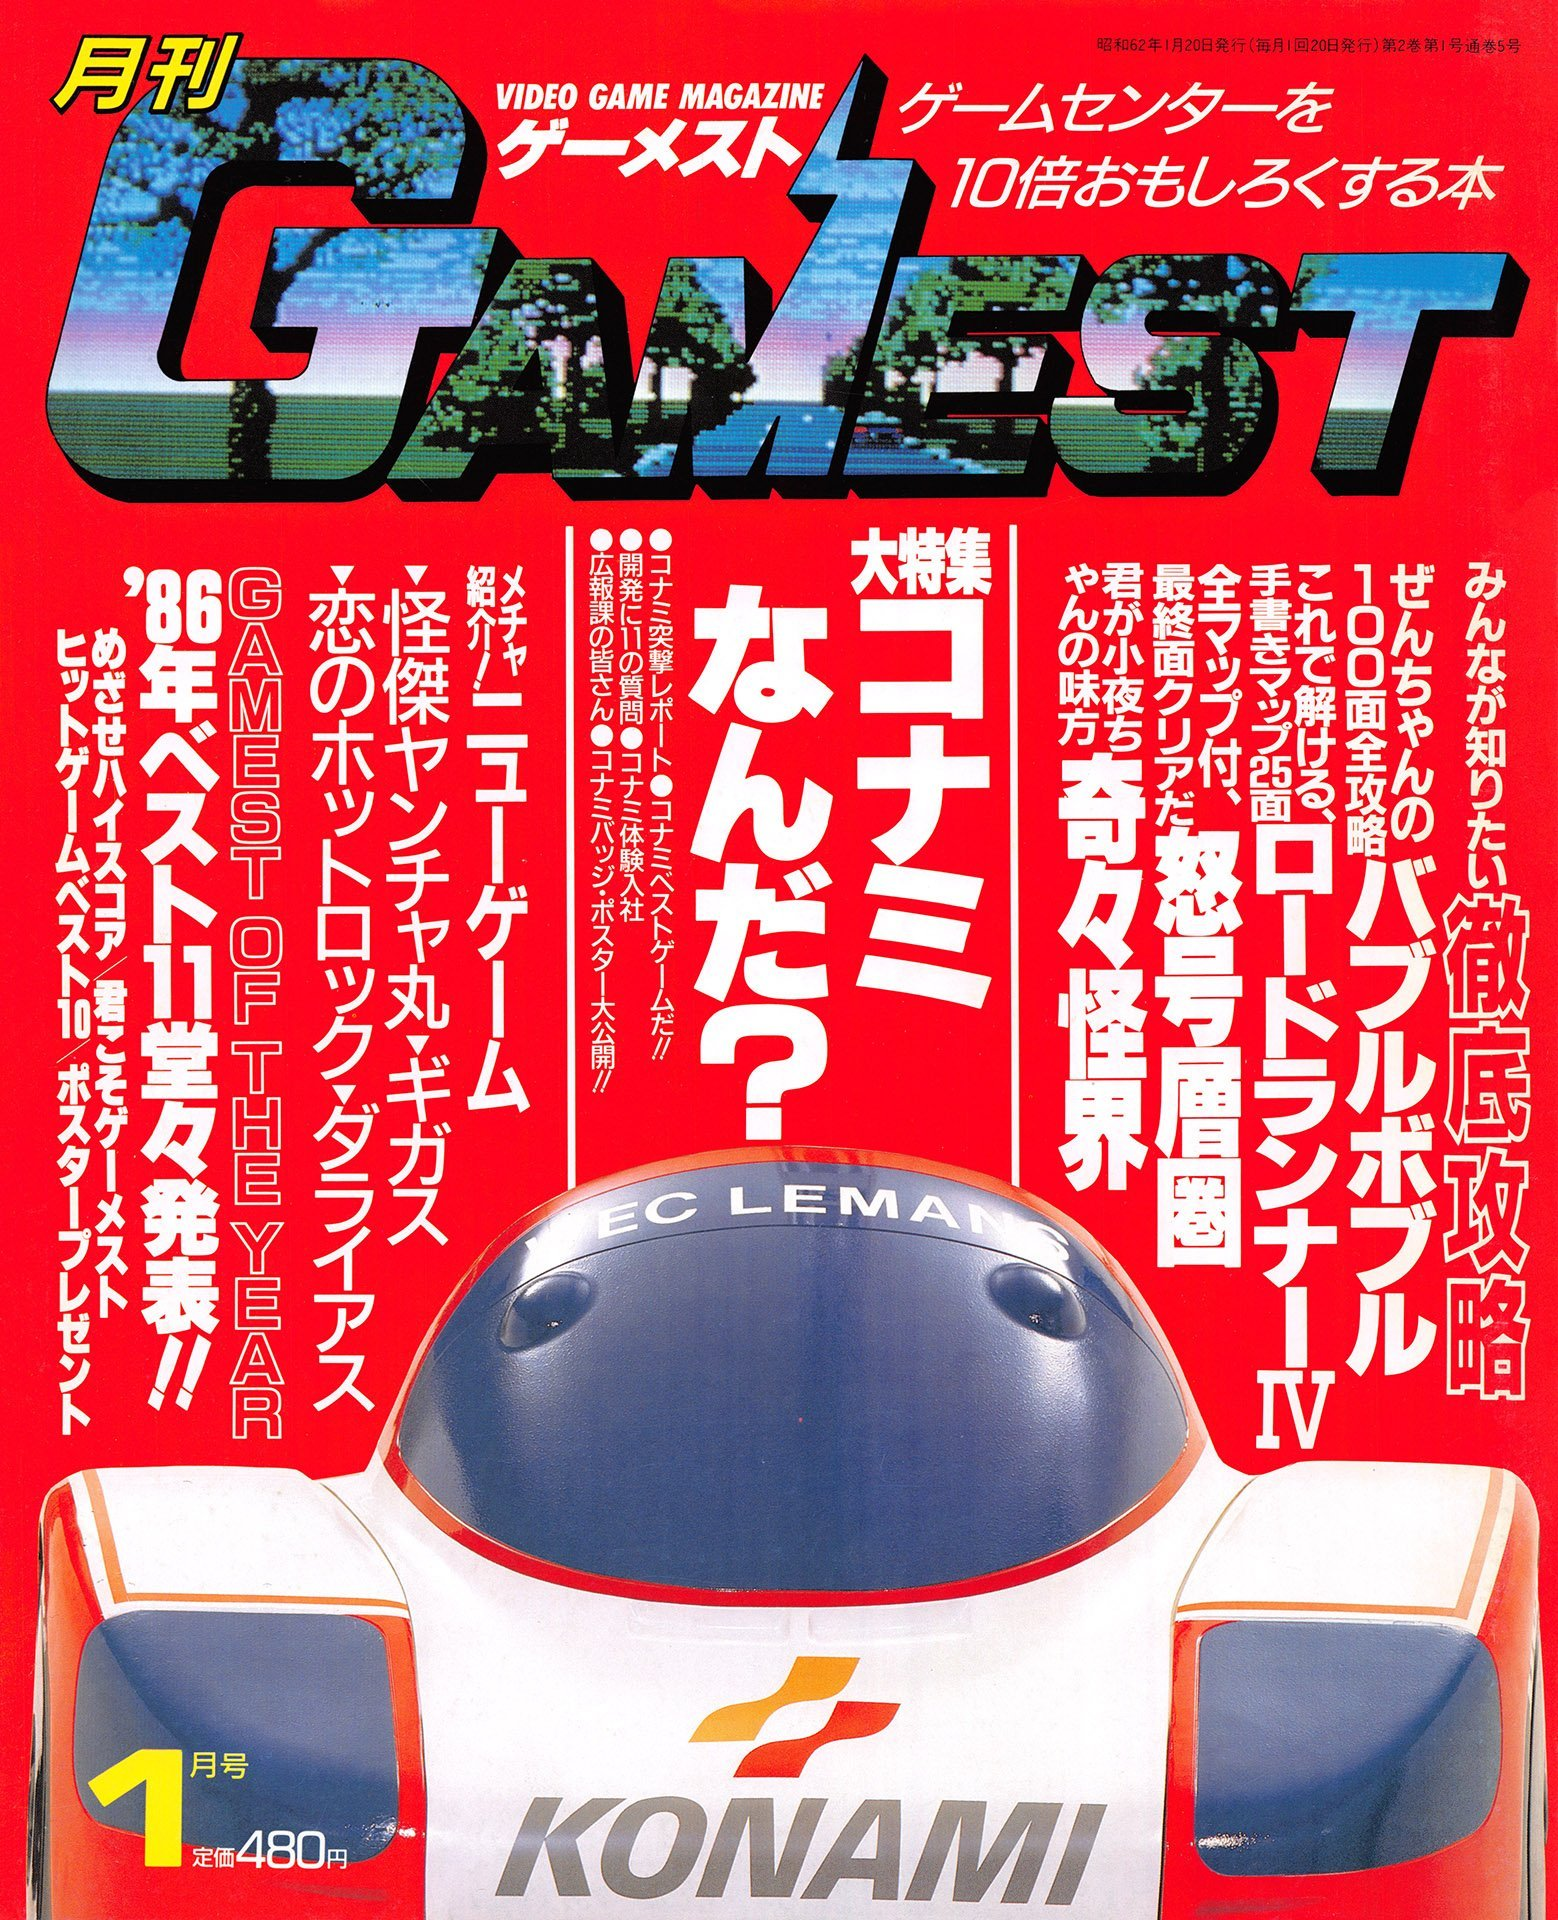 Gamest 005 (January 1987)